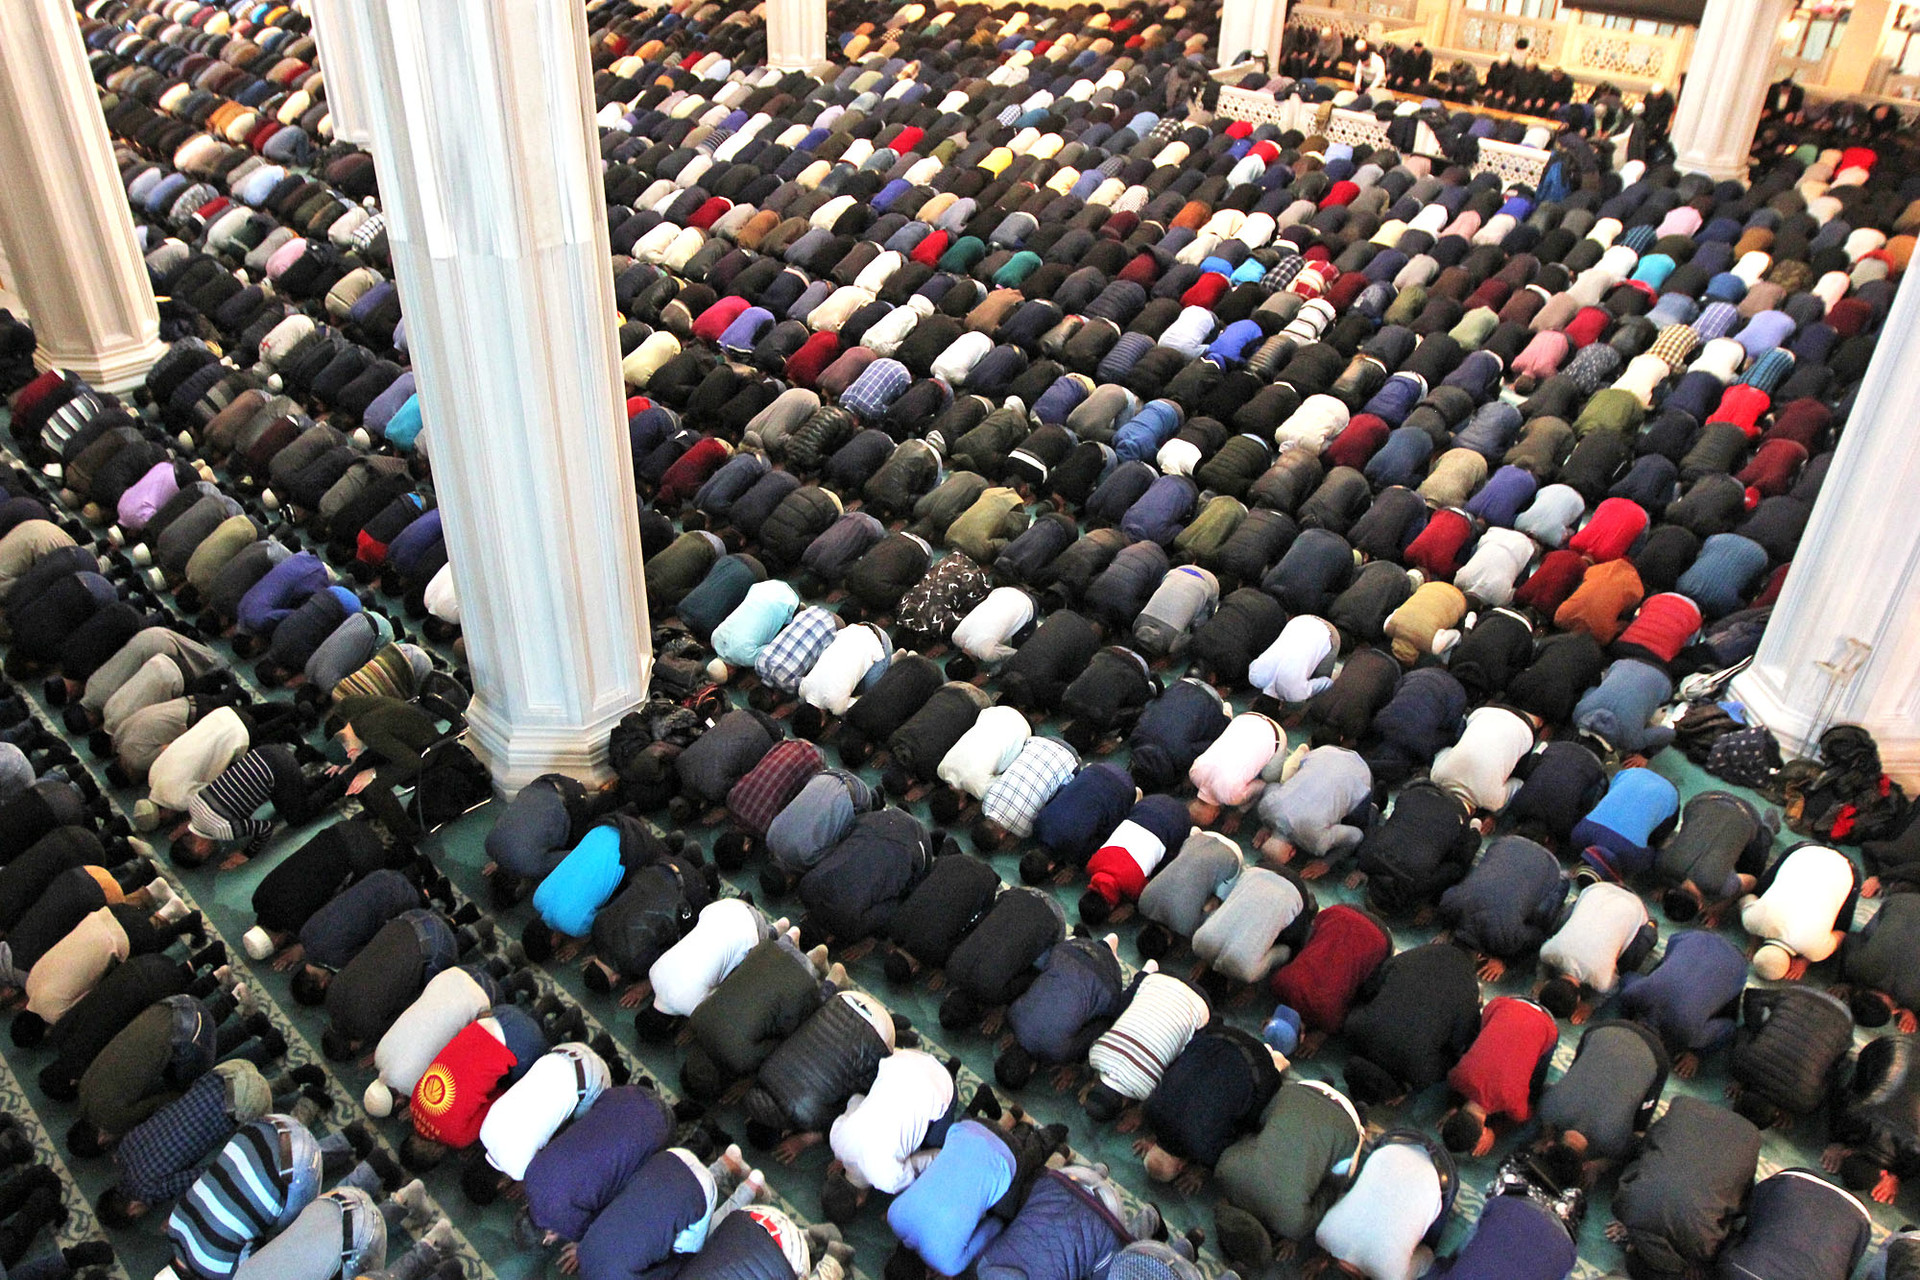 Foto Suasana Jumatan Di Masjid Agung Moskow Russia Beyond